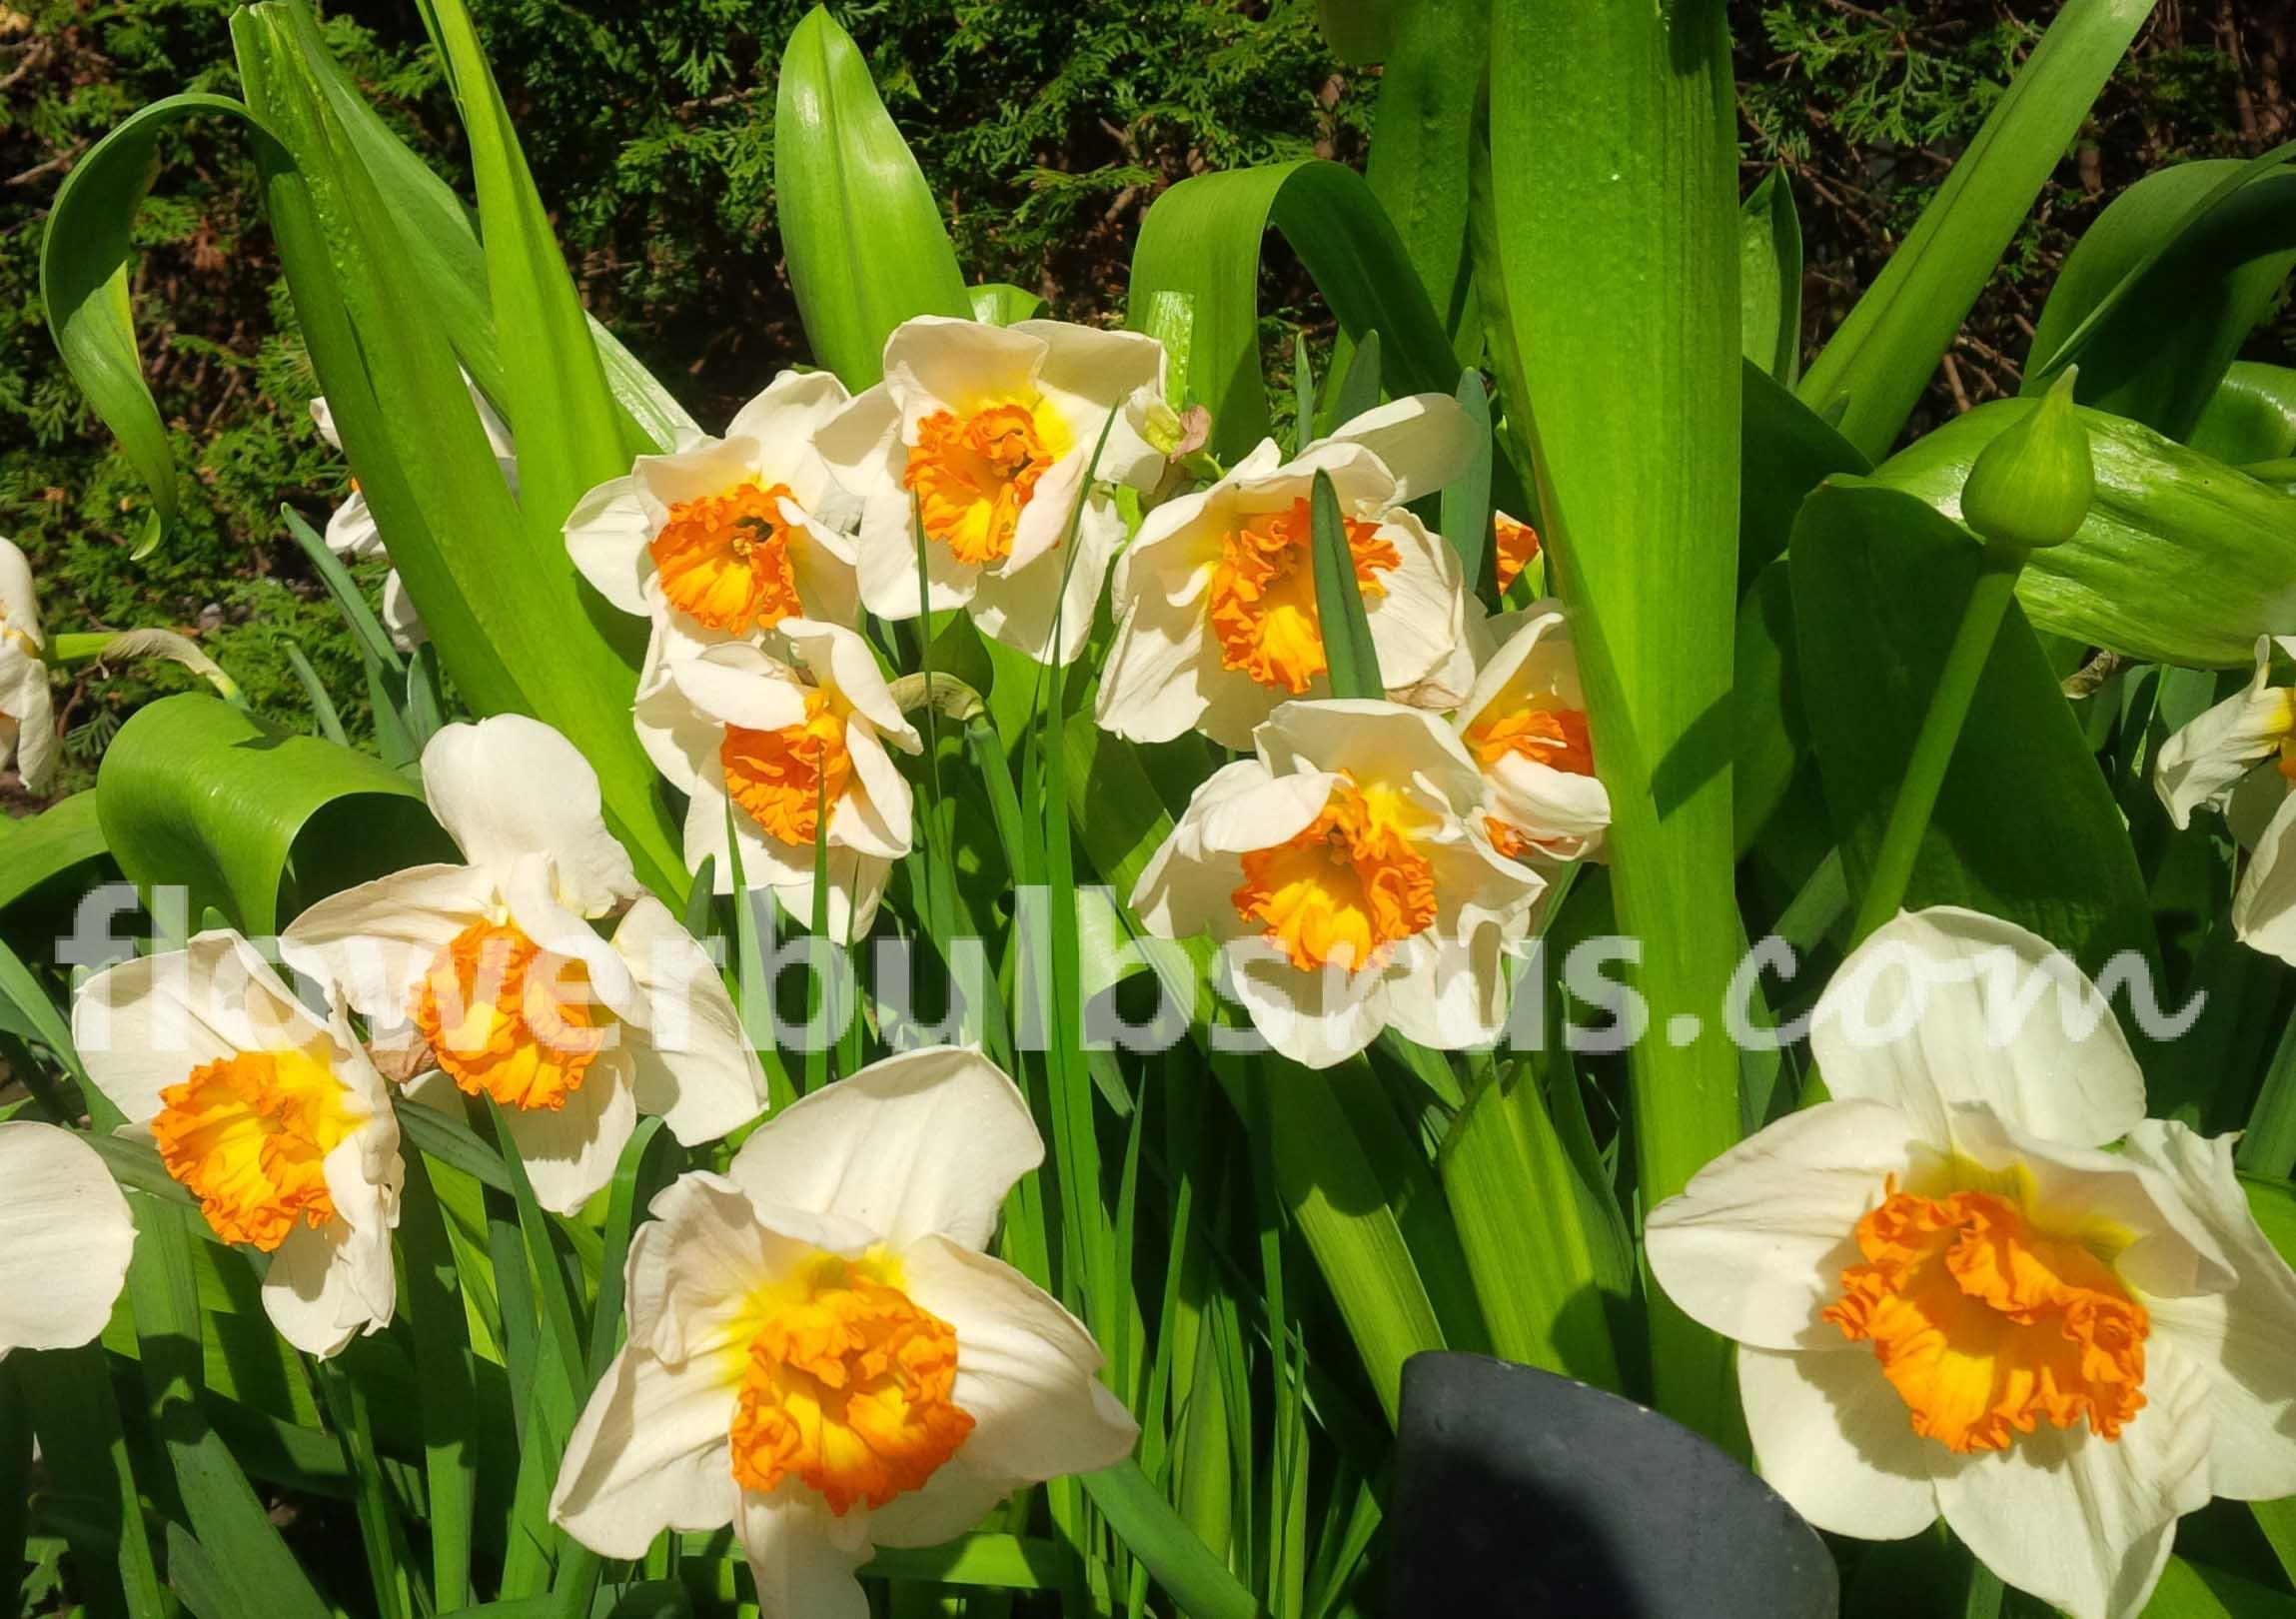 cdv full throttle Narcissus